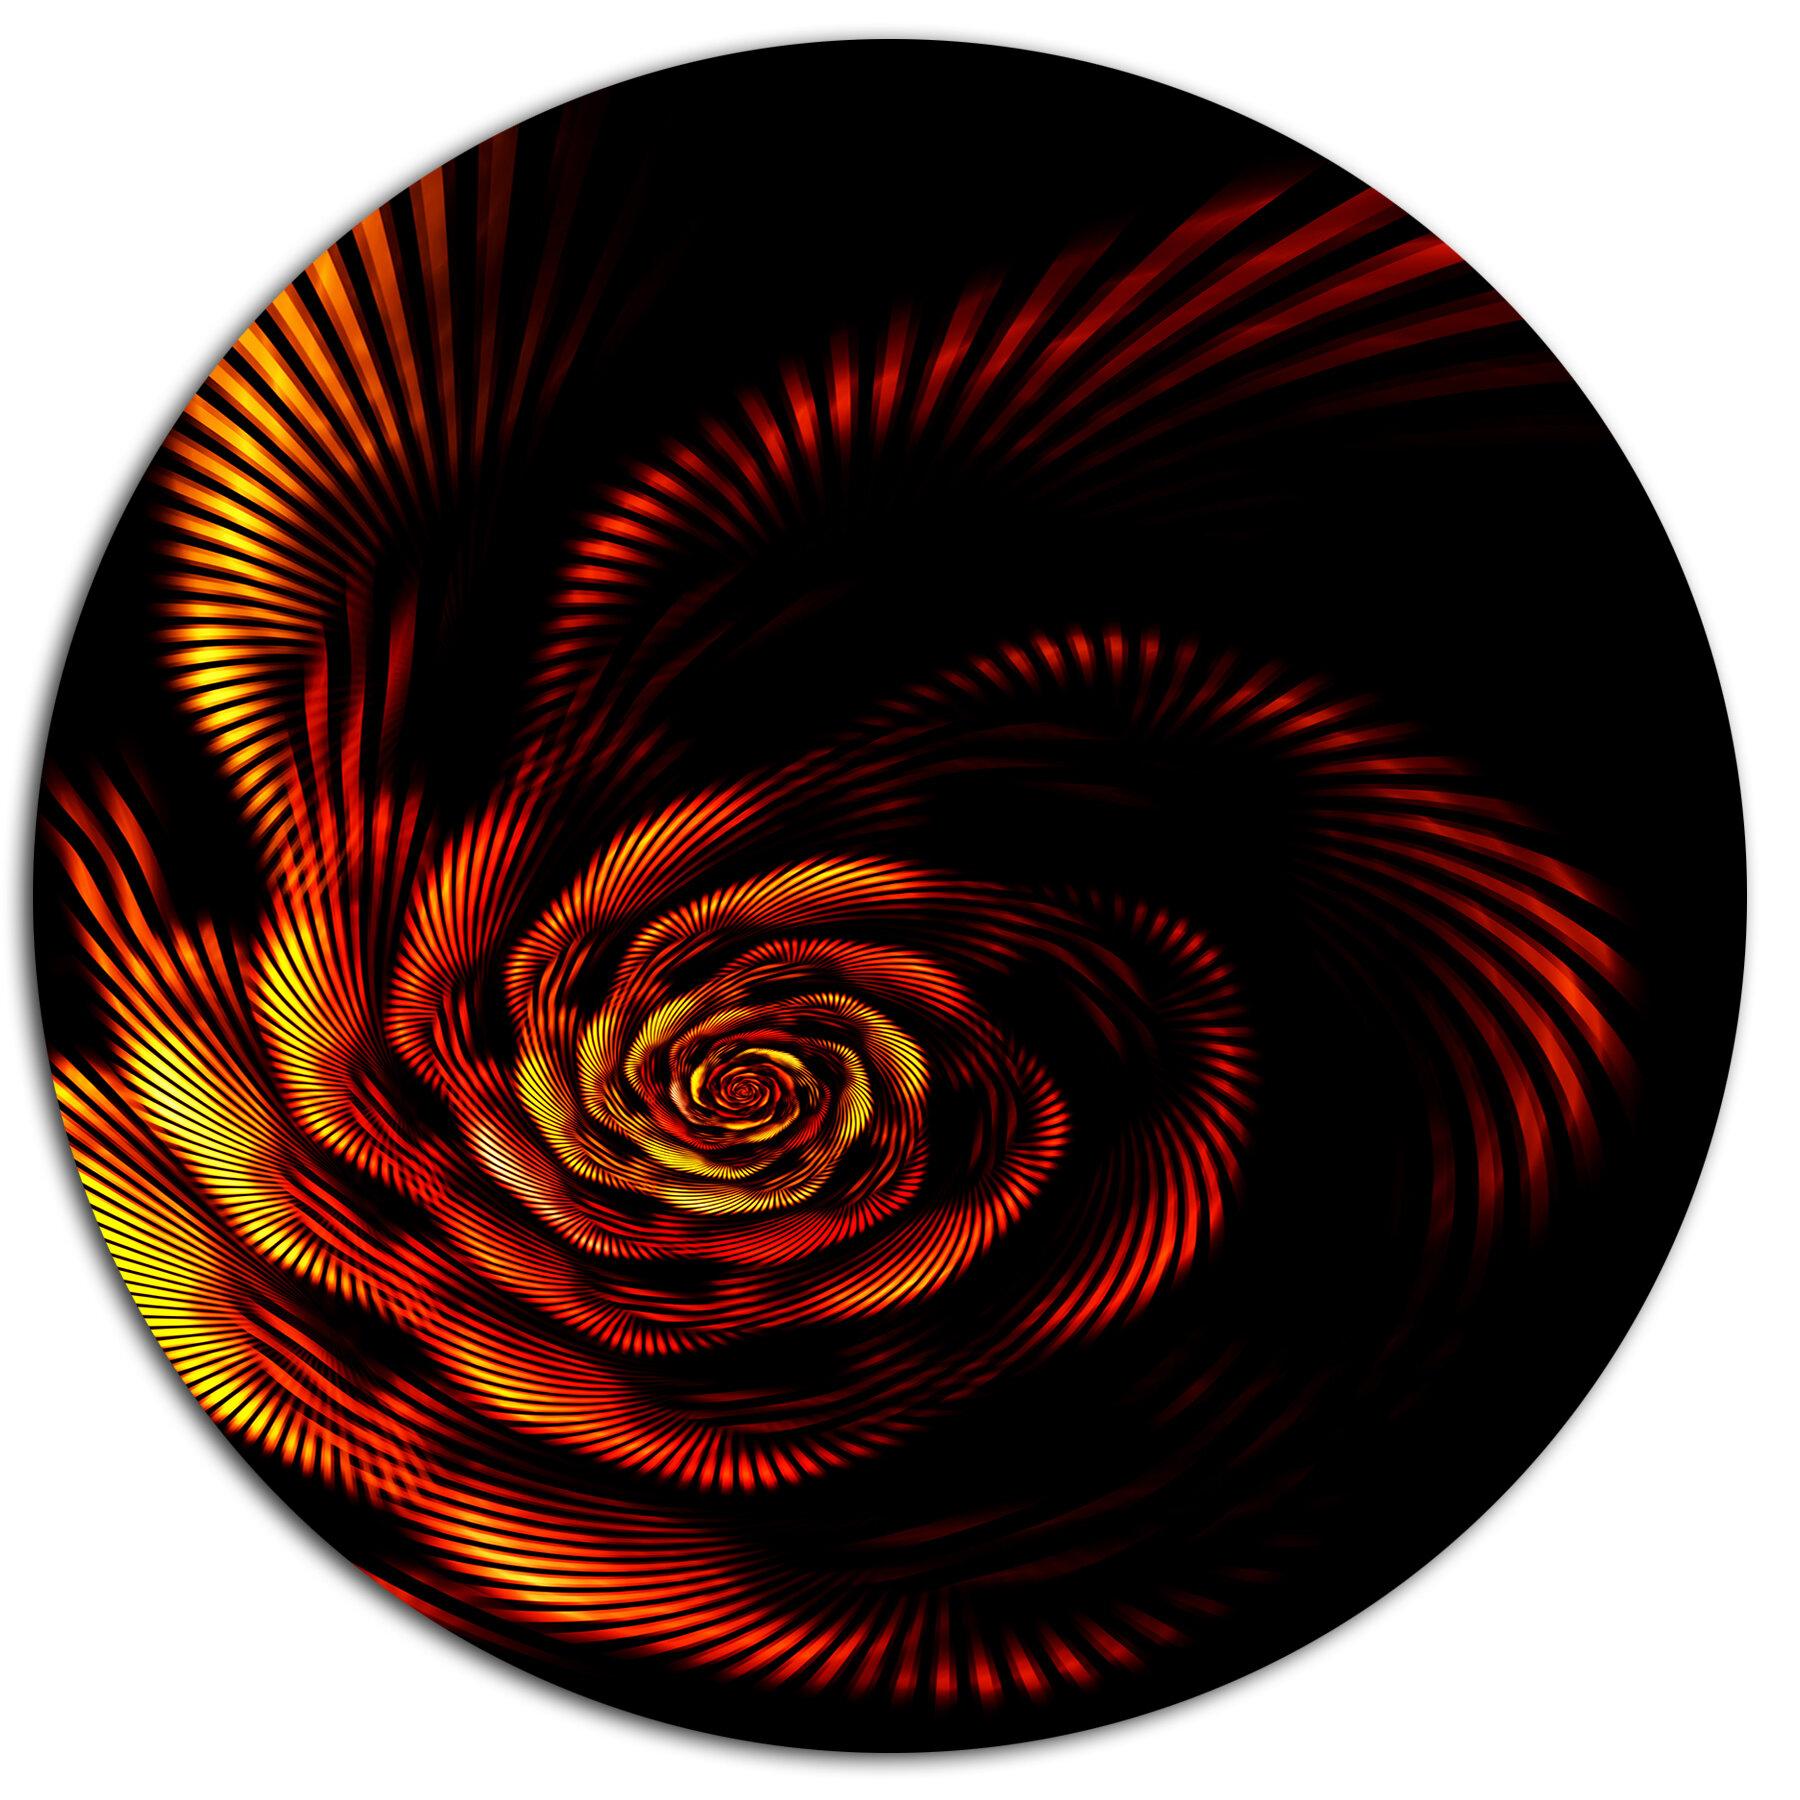 Designart Fiery Rose Fractal Flower Of Passion Graphic Art Print On Metal Wayfair